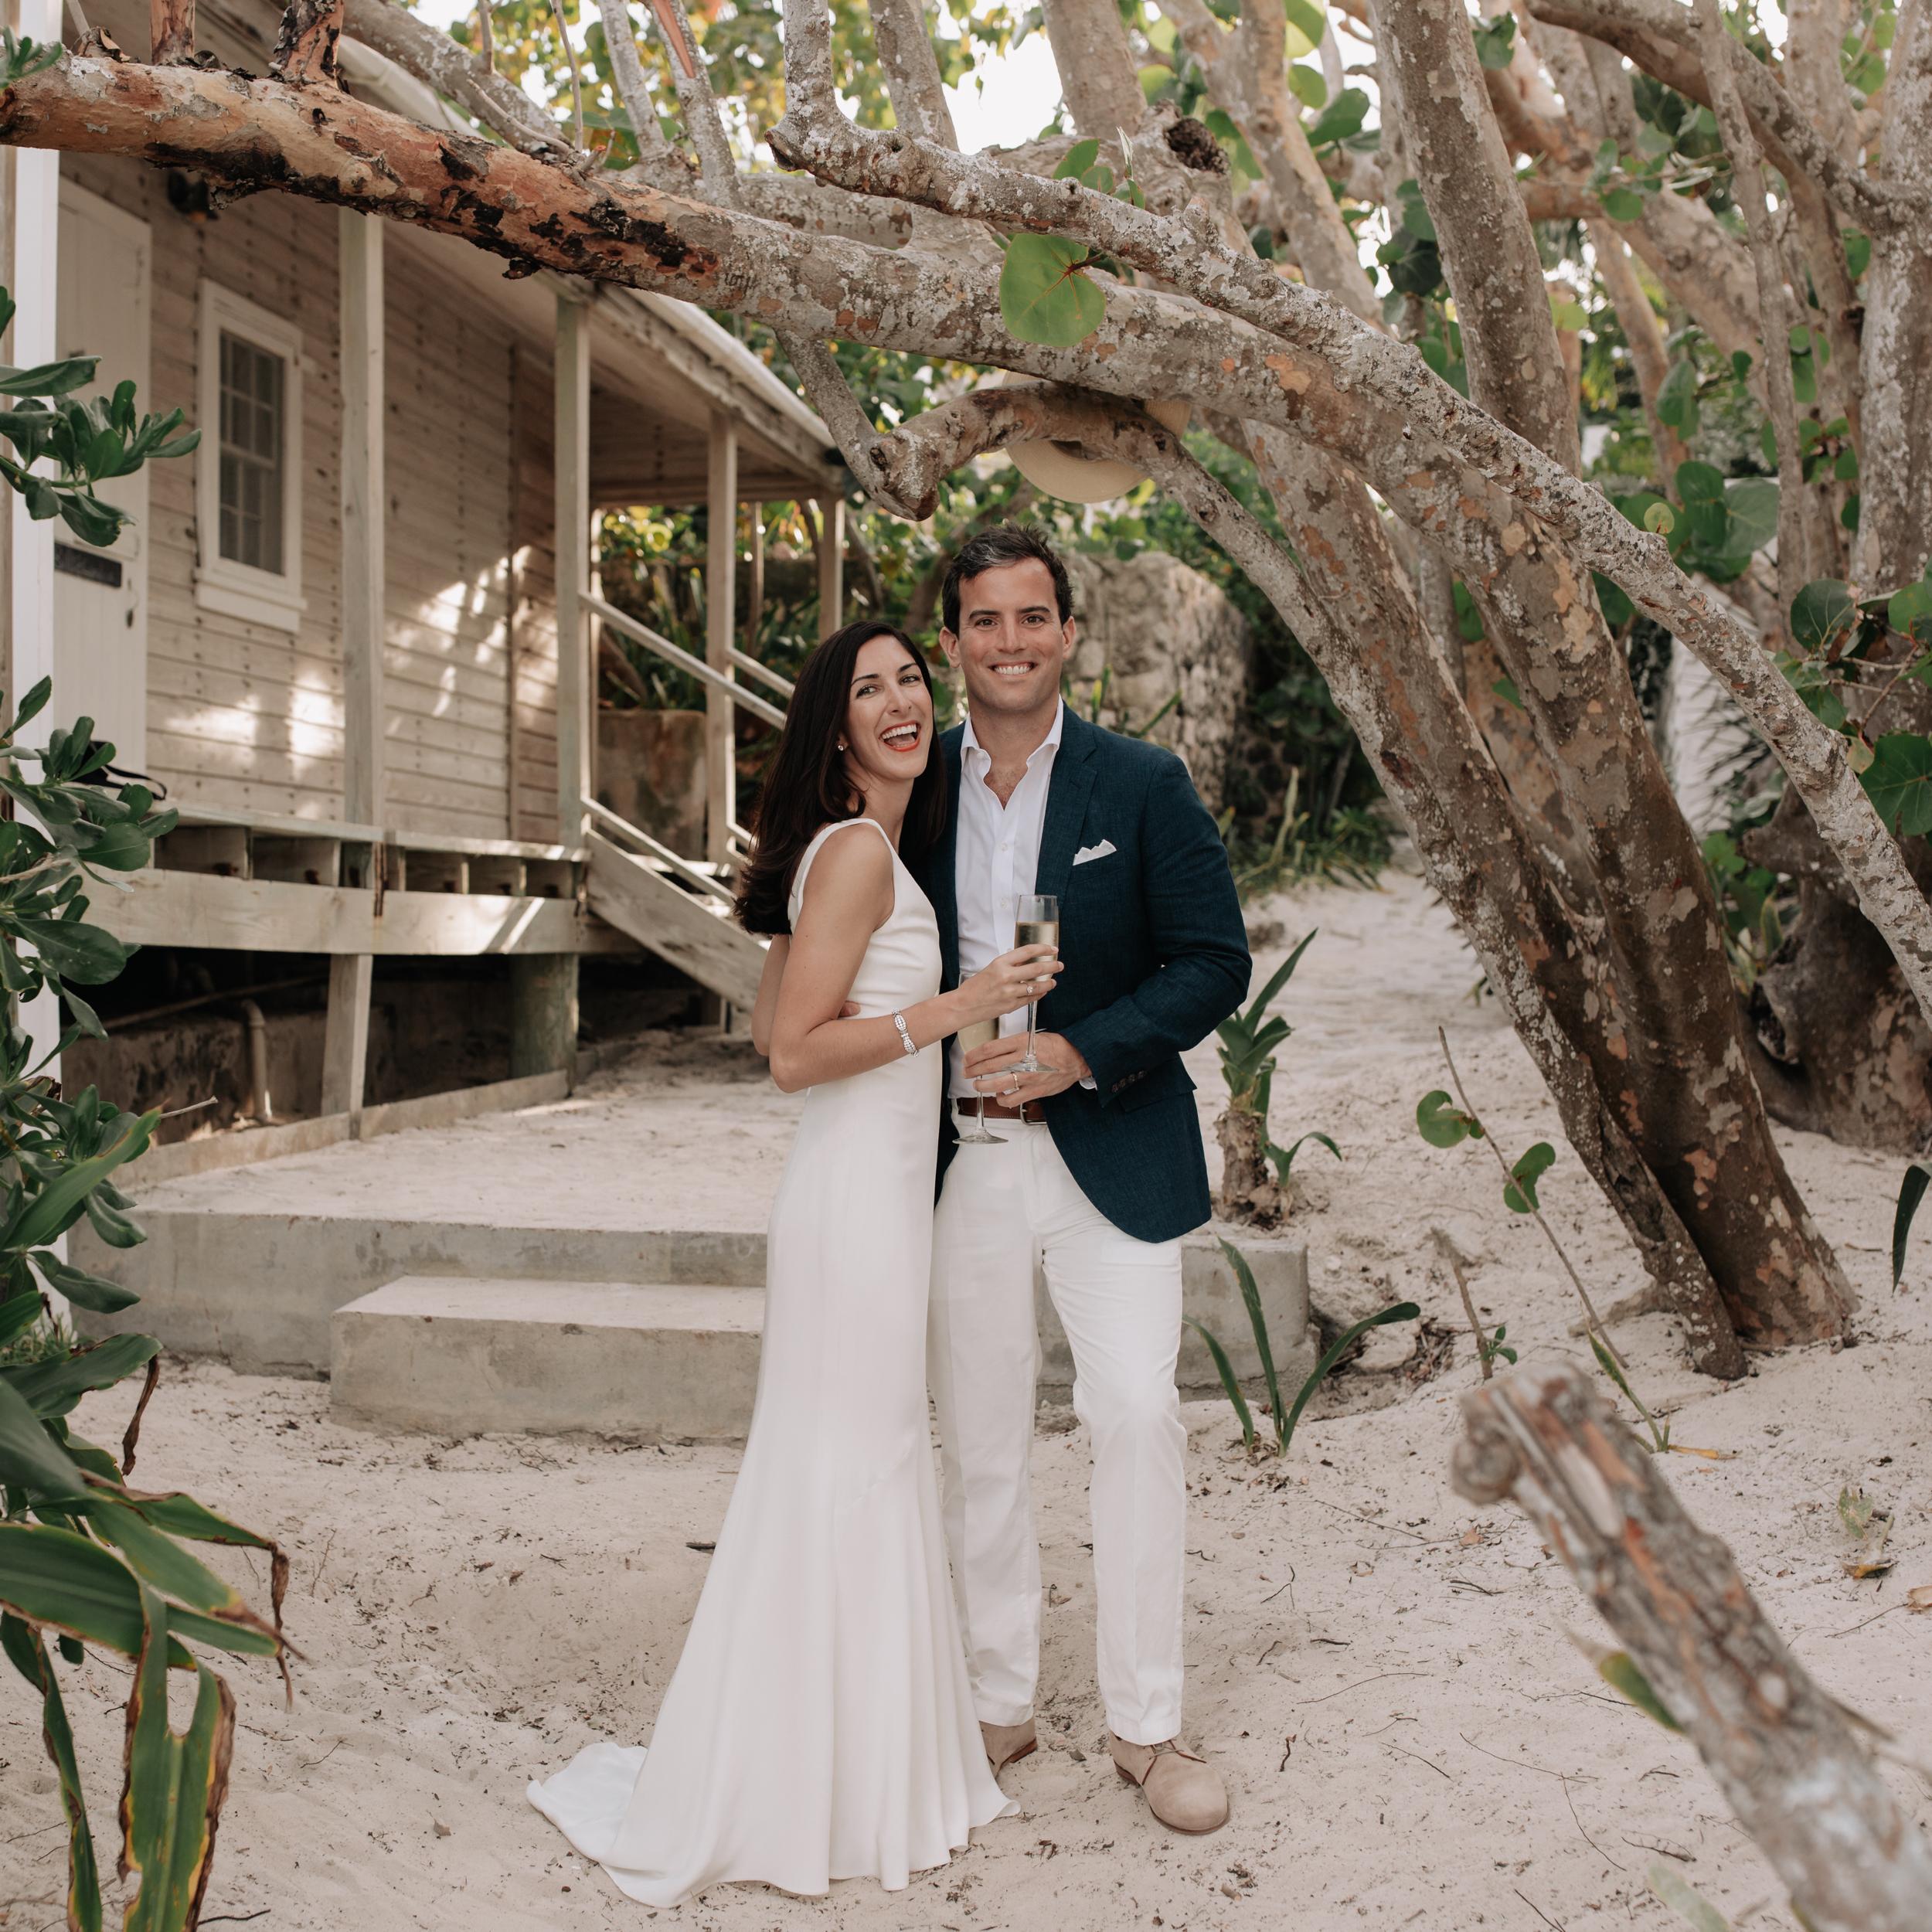 Harbour-Island-Ocean-View-Club-Wedding-Photographer_60.jpg